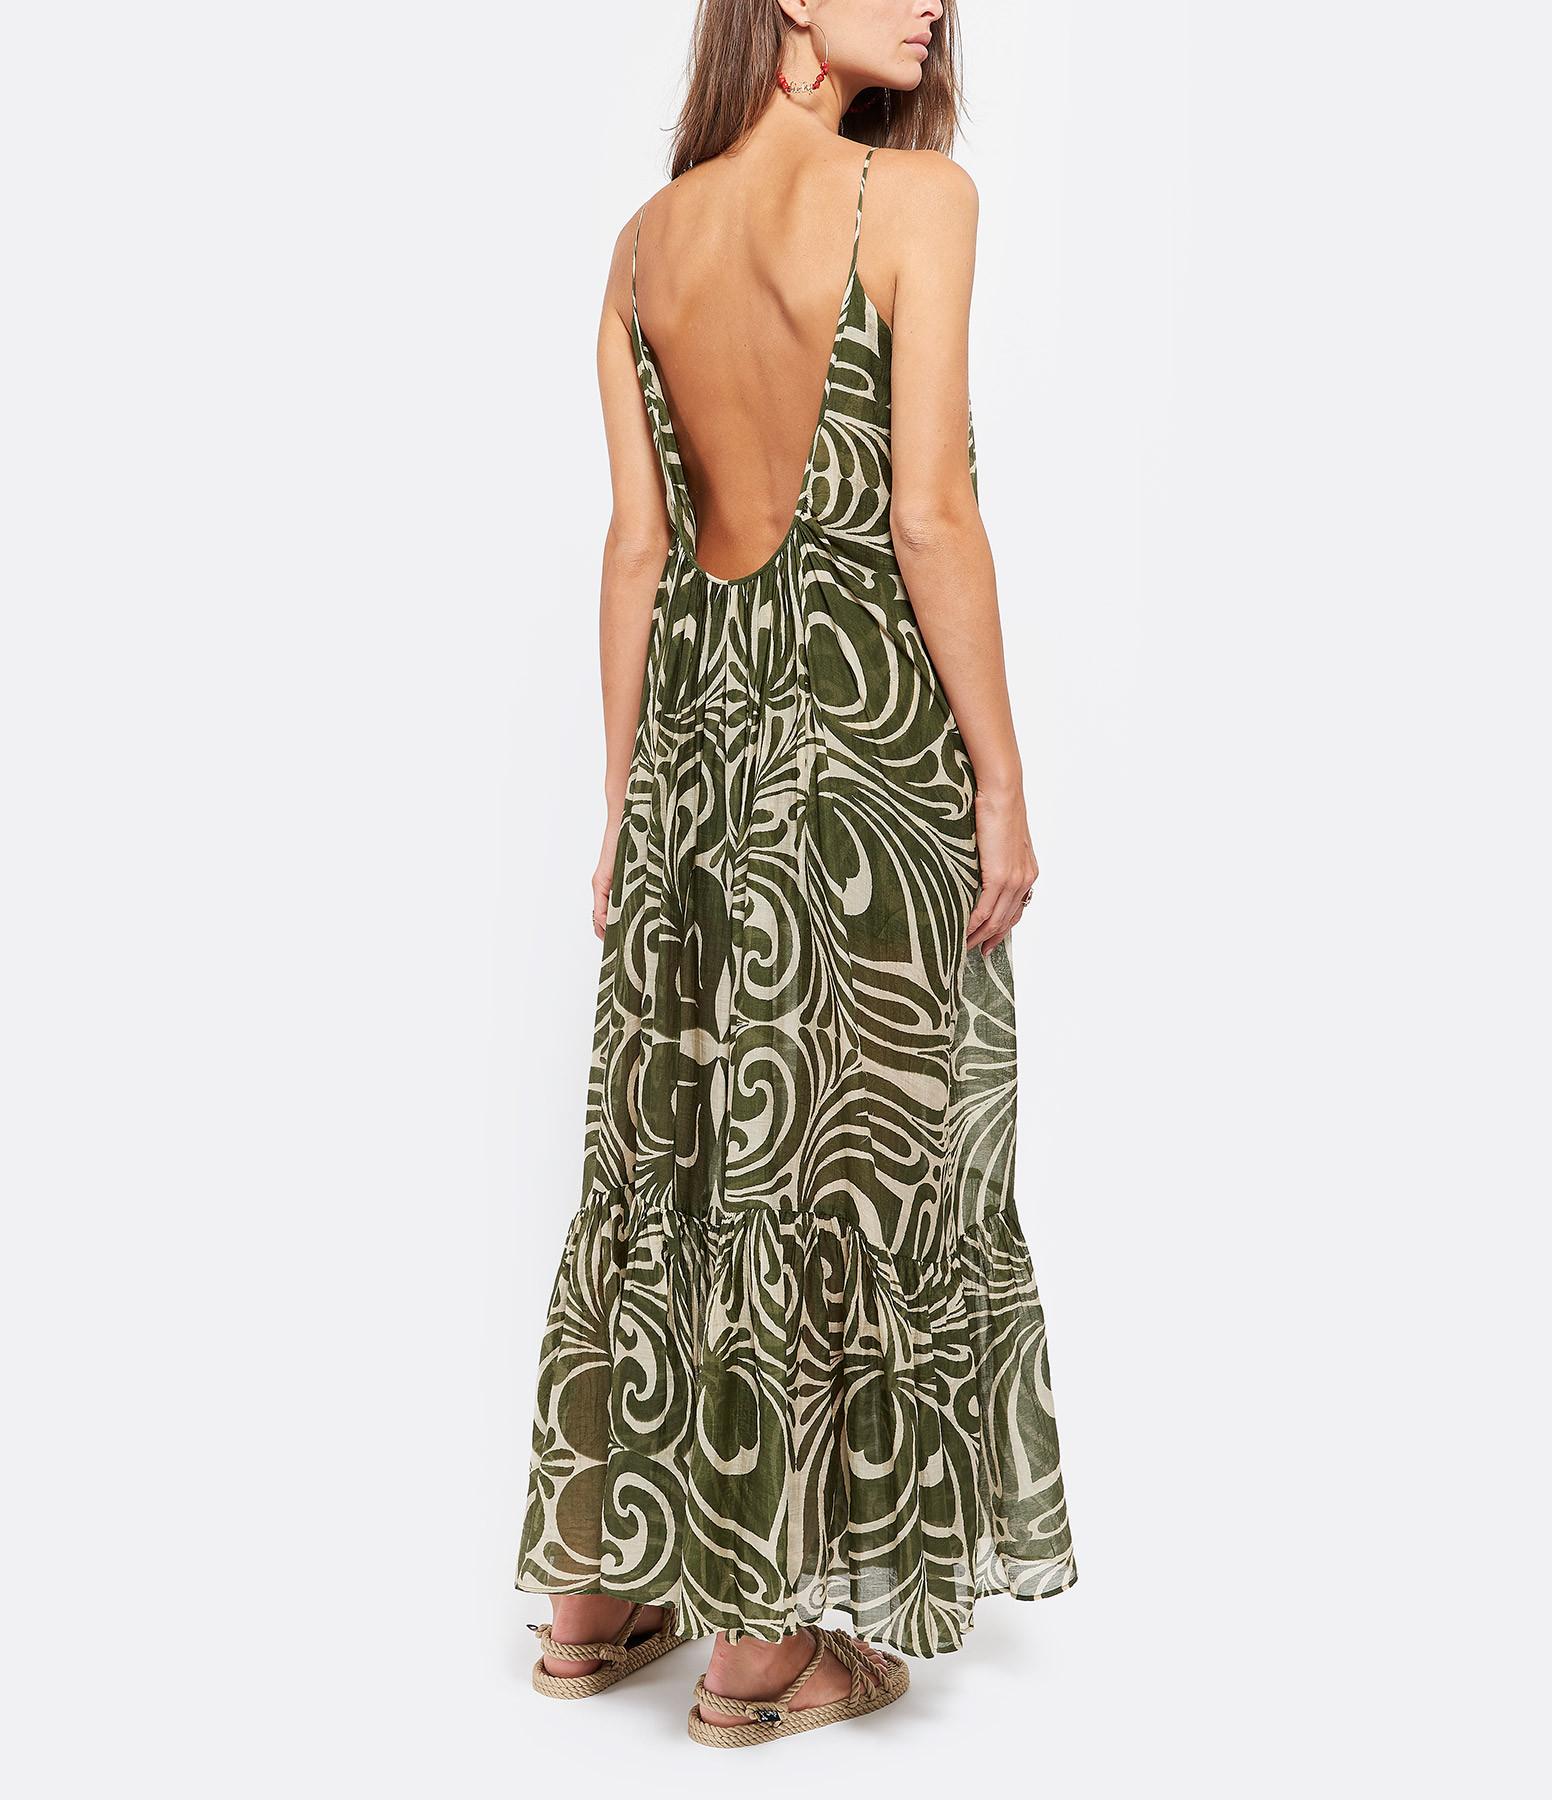 LAURENCE BRAS - Robe Saint Tropez Coton Soie Vert